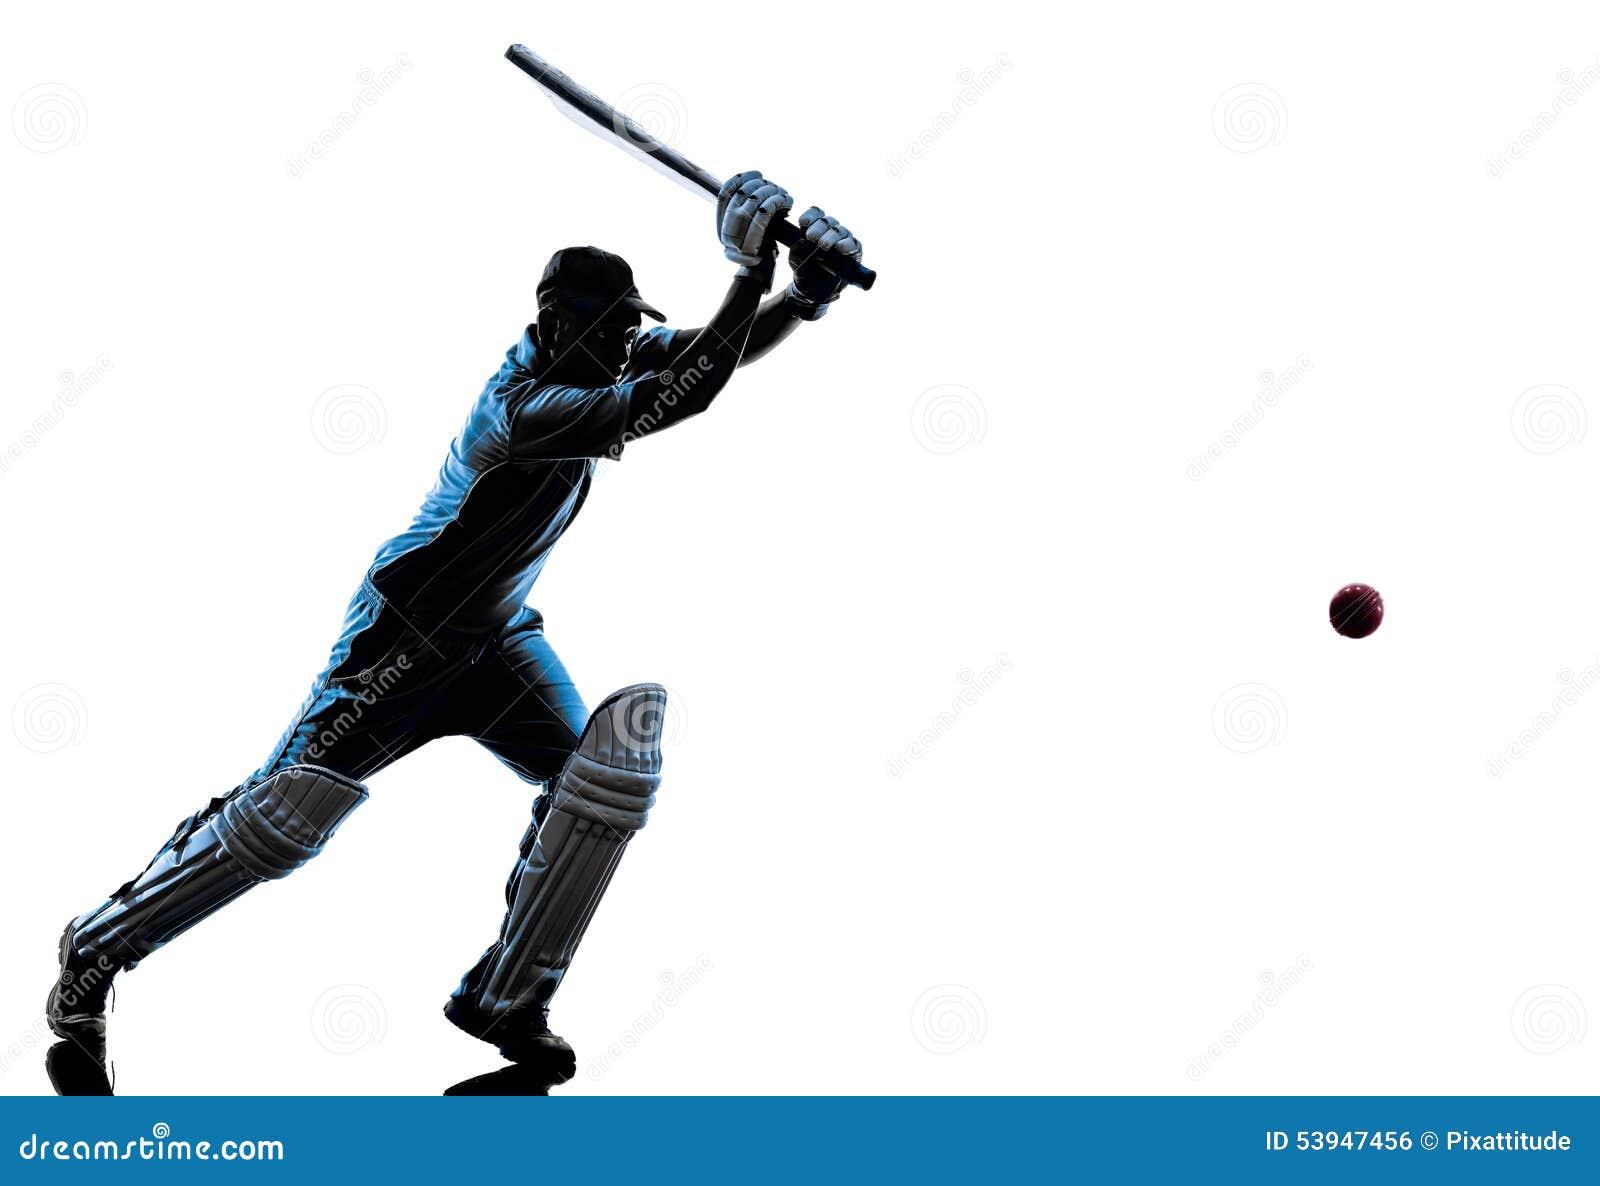 how to draw a cricket batsman